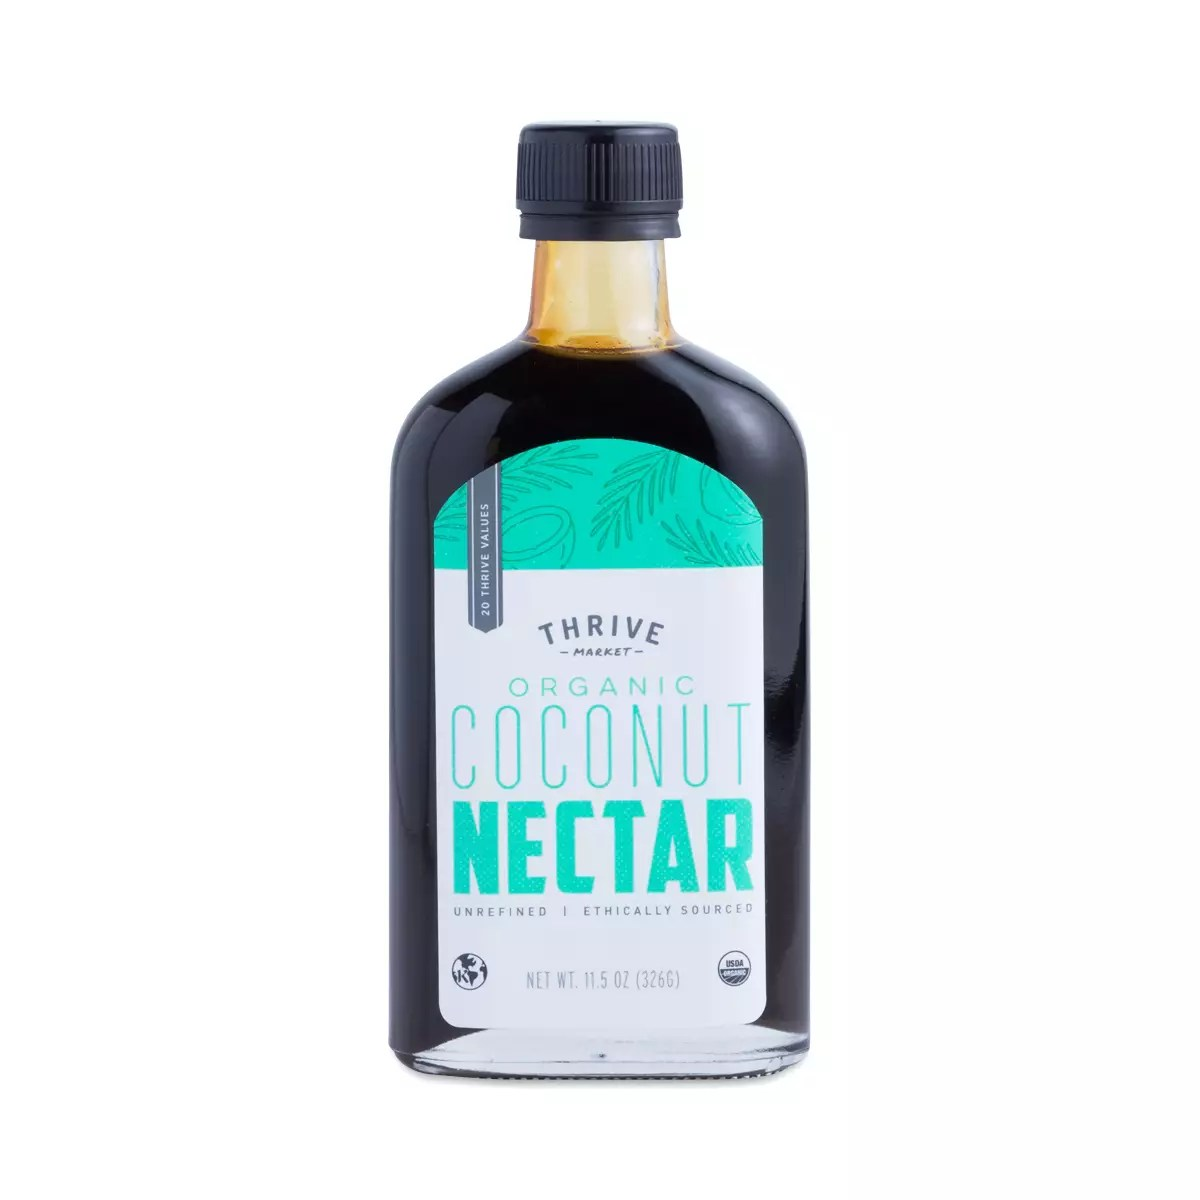 Organic Coconut Nectar